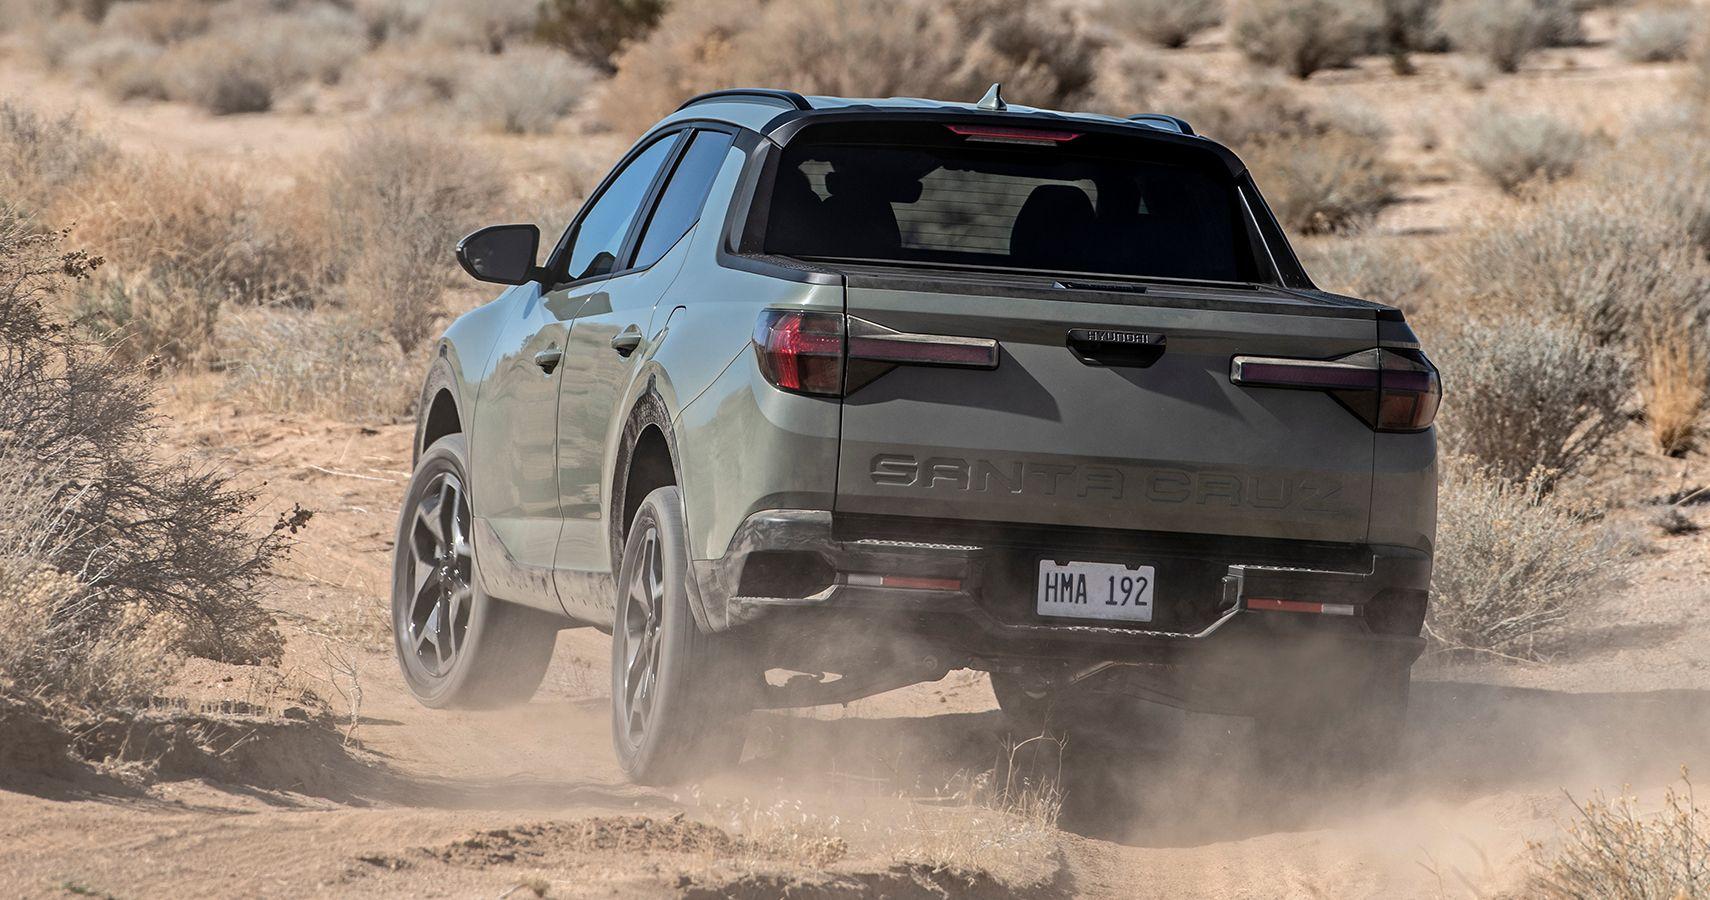 Move Over Corvette! The Hyundai Santa Cruz Is The Fastest-Selling Vehicle